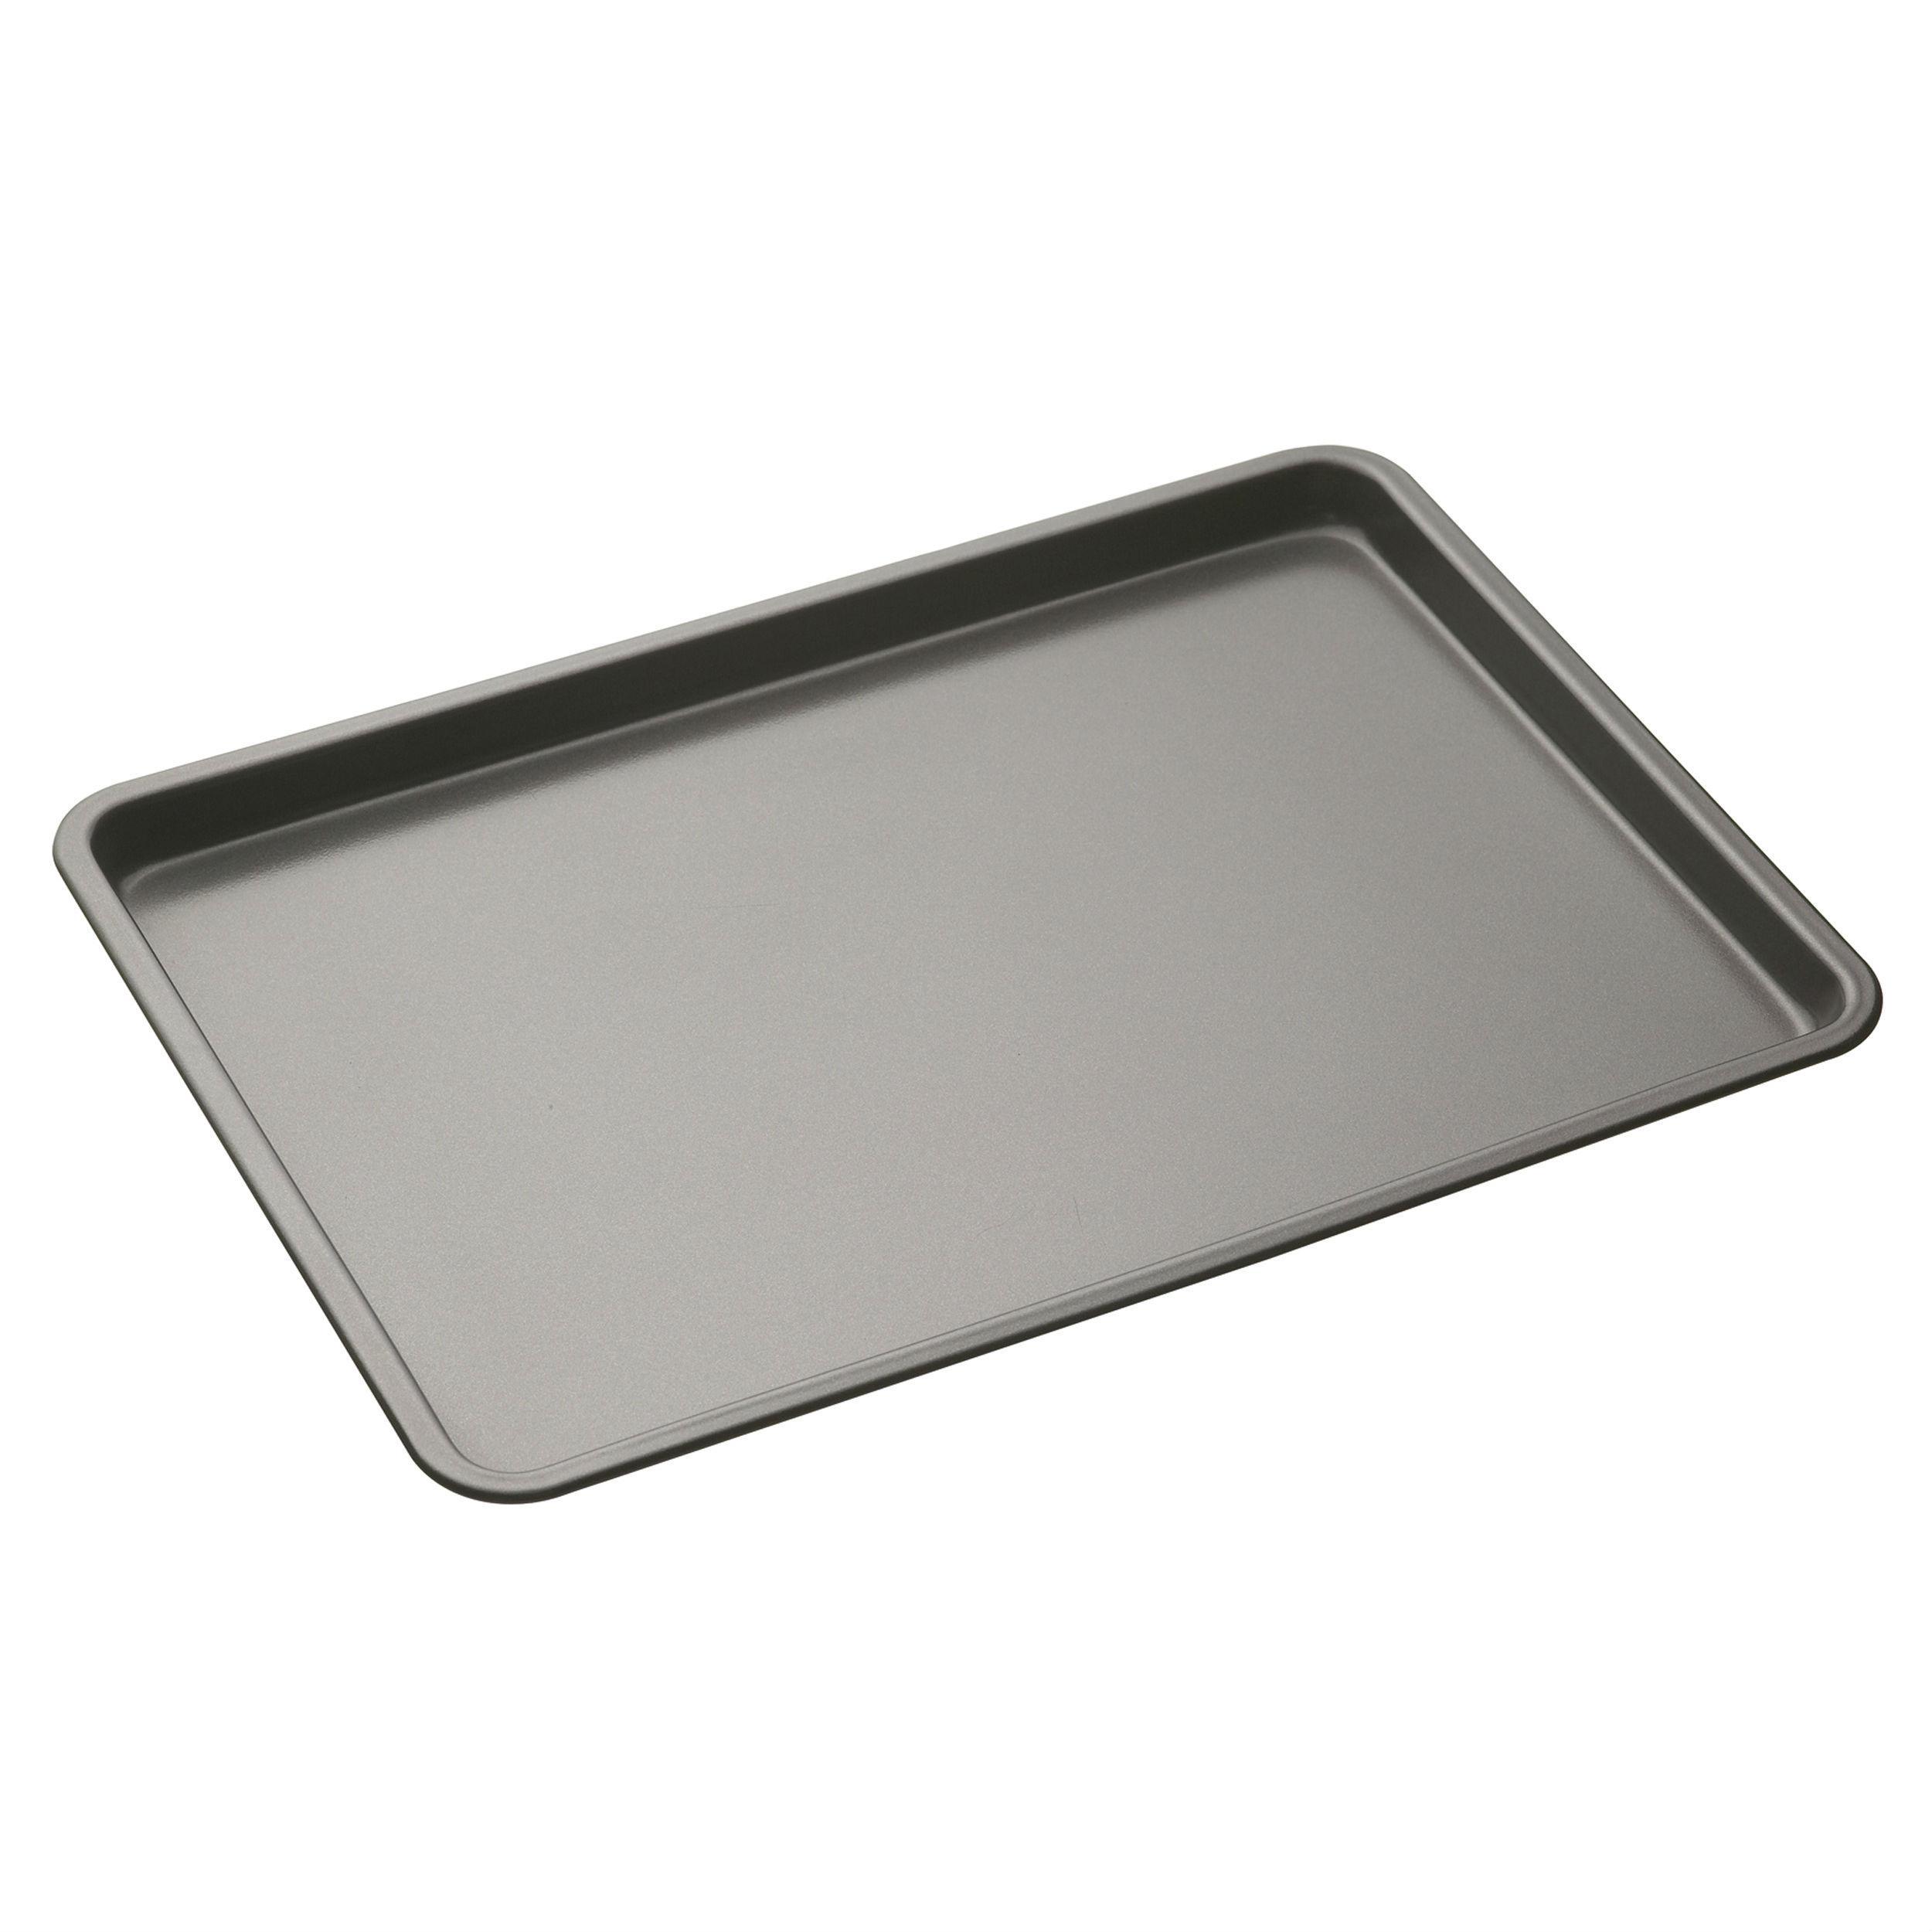 Ikea Uk Master Class Non Stick Baking Tray 35 X 25 Cm 14 Quot X 10